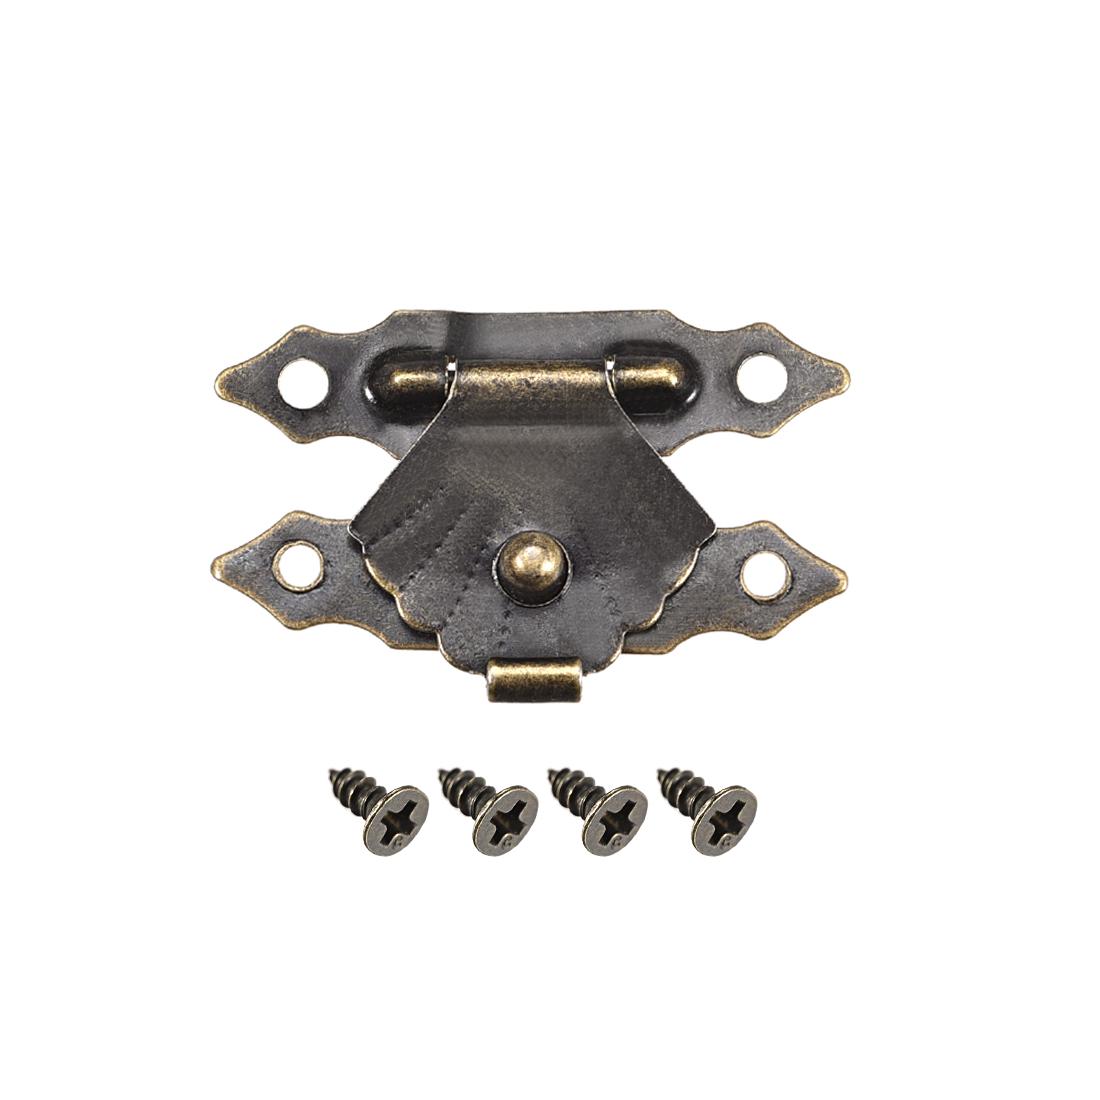 Wood Case Box Hasp 29x19mm Antique Latches Hook Bronze Tone, 10 Pcs